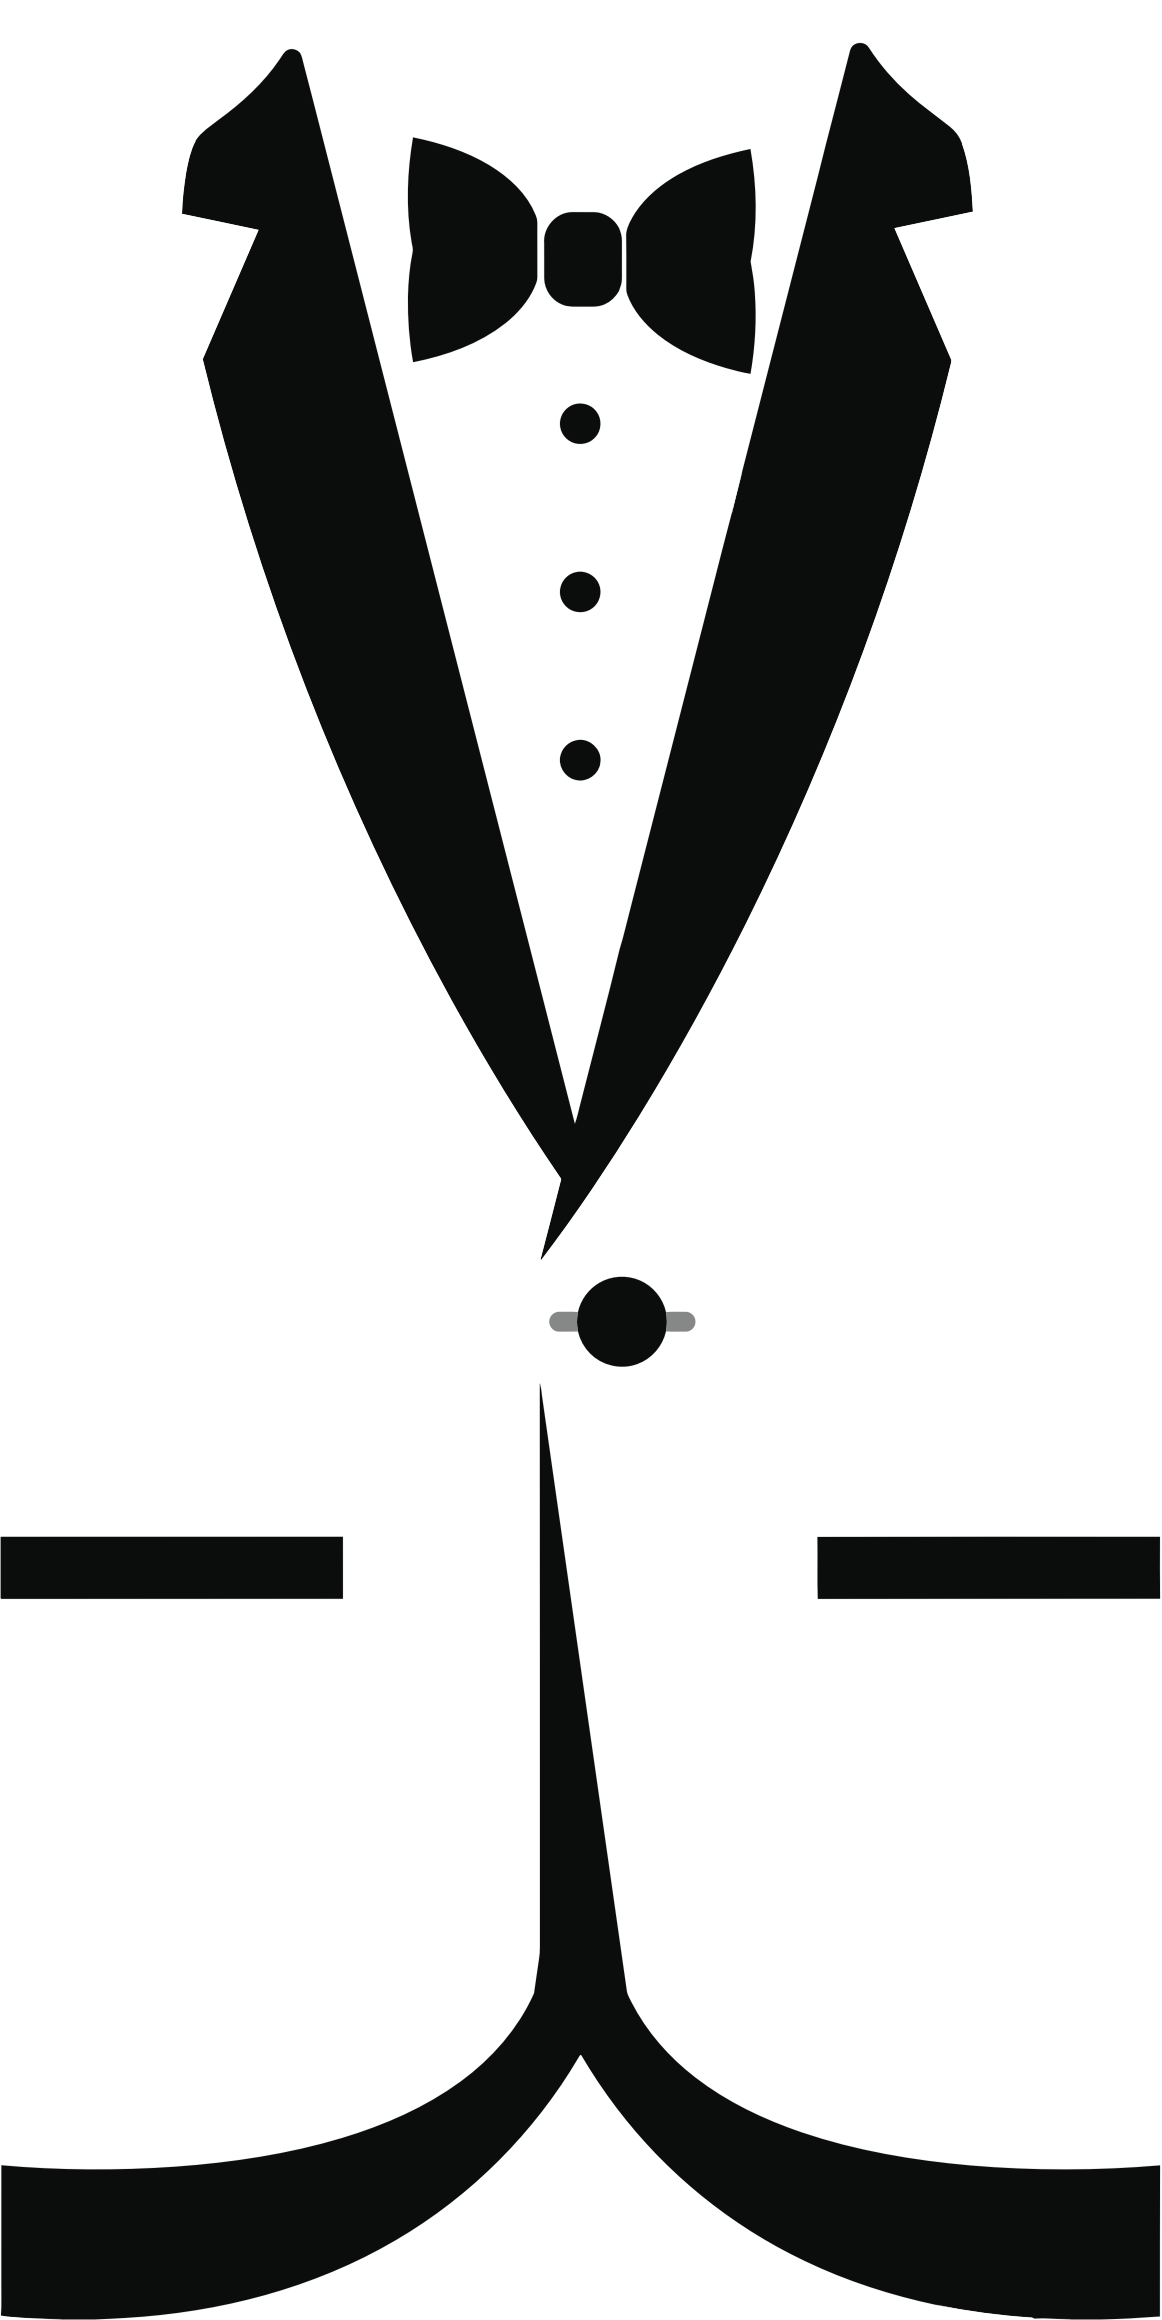 graphic transparent download Big image png. Tuxedo clipart